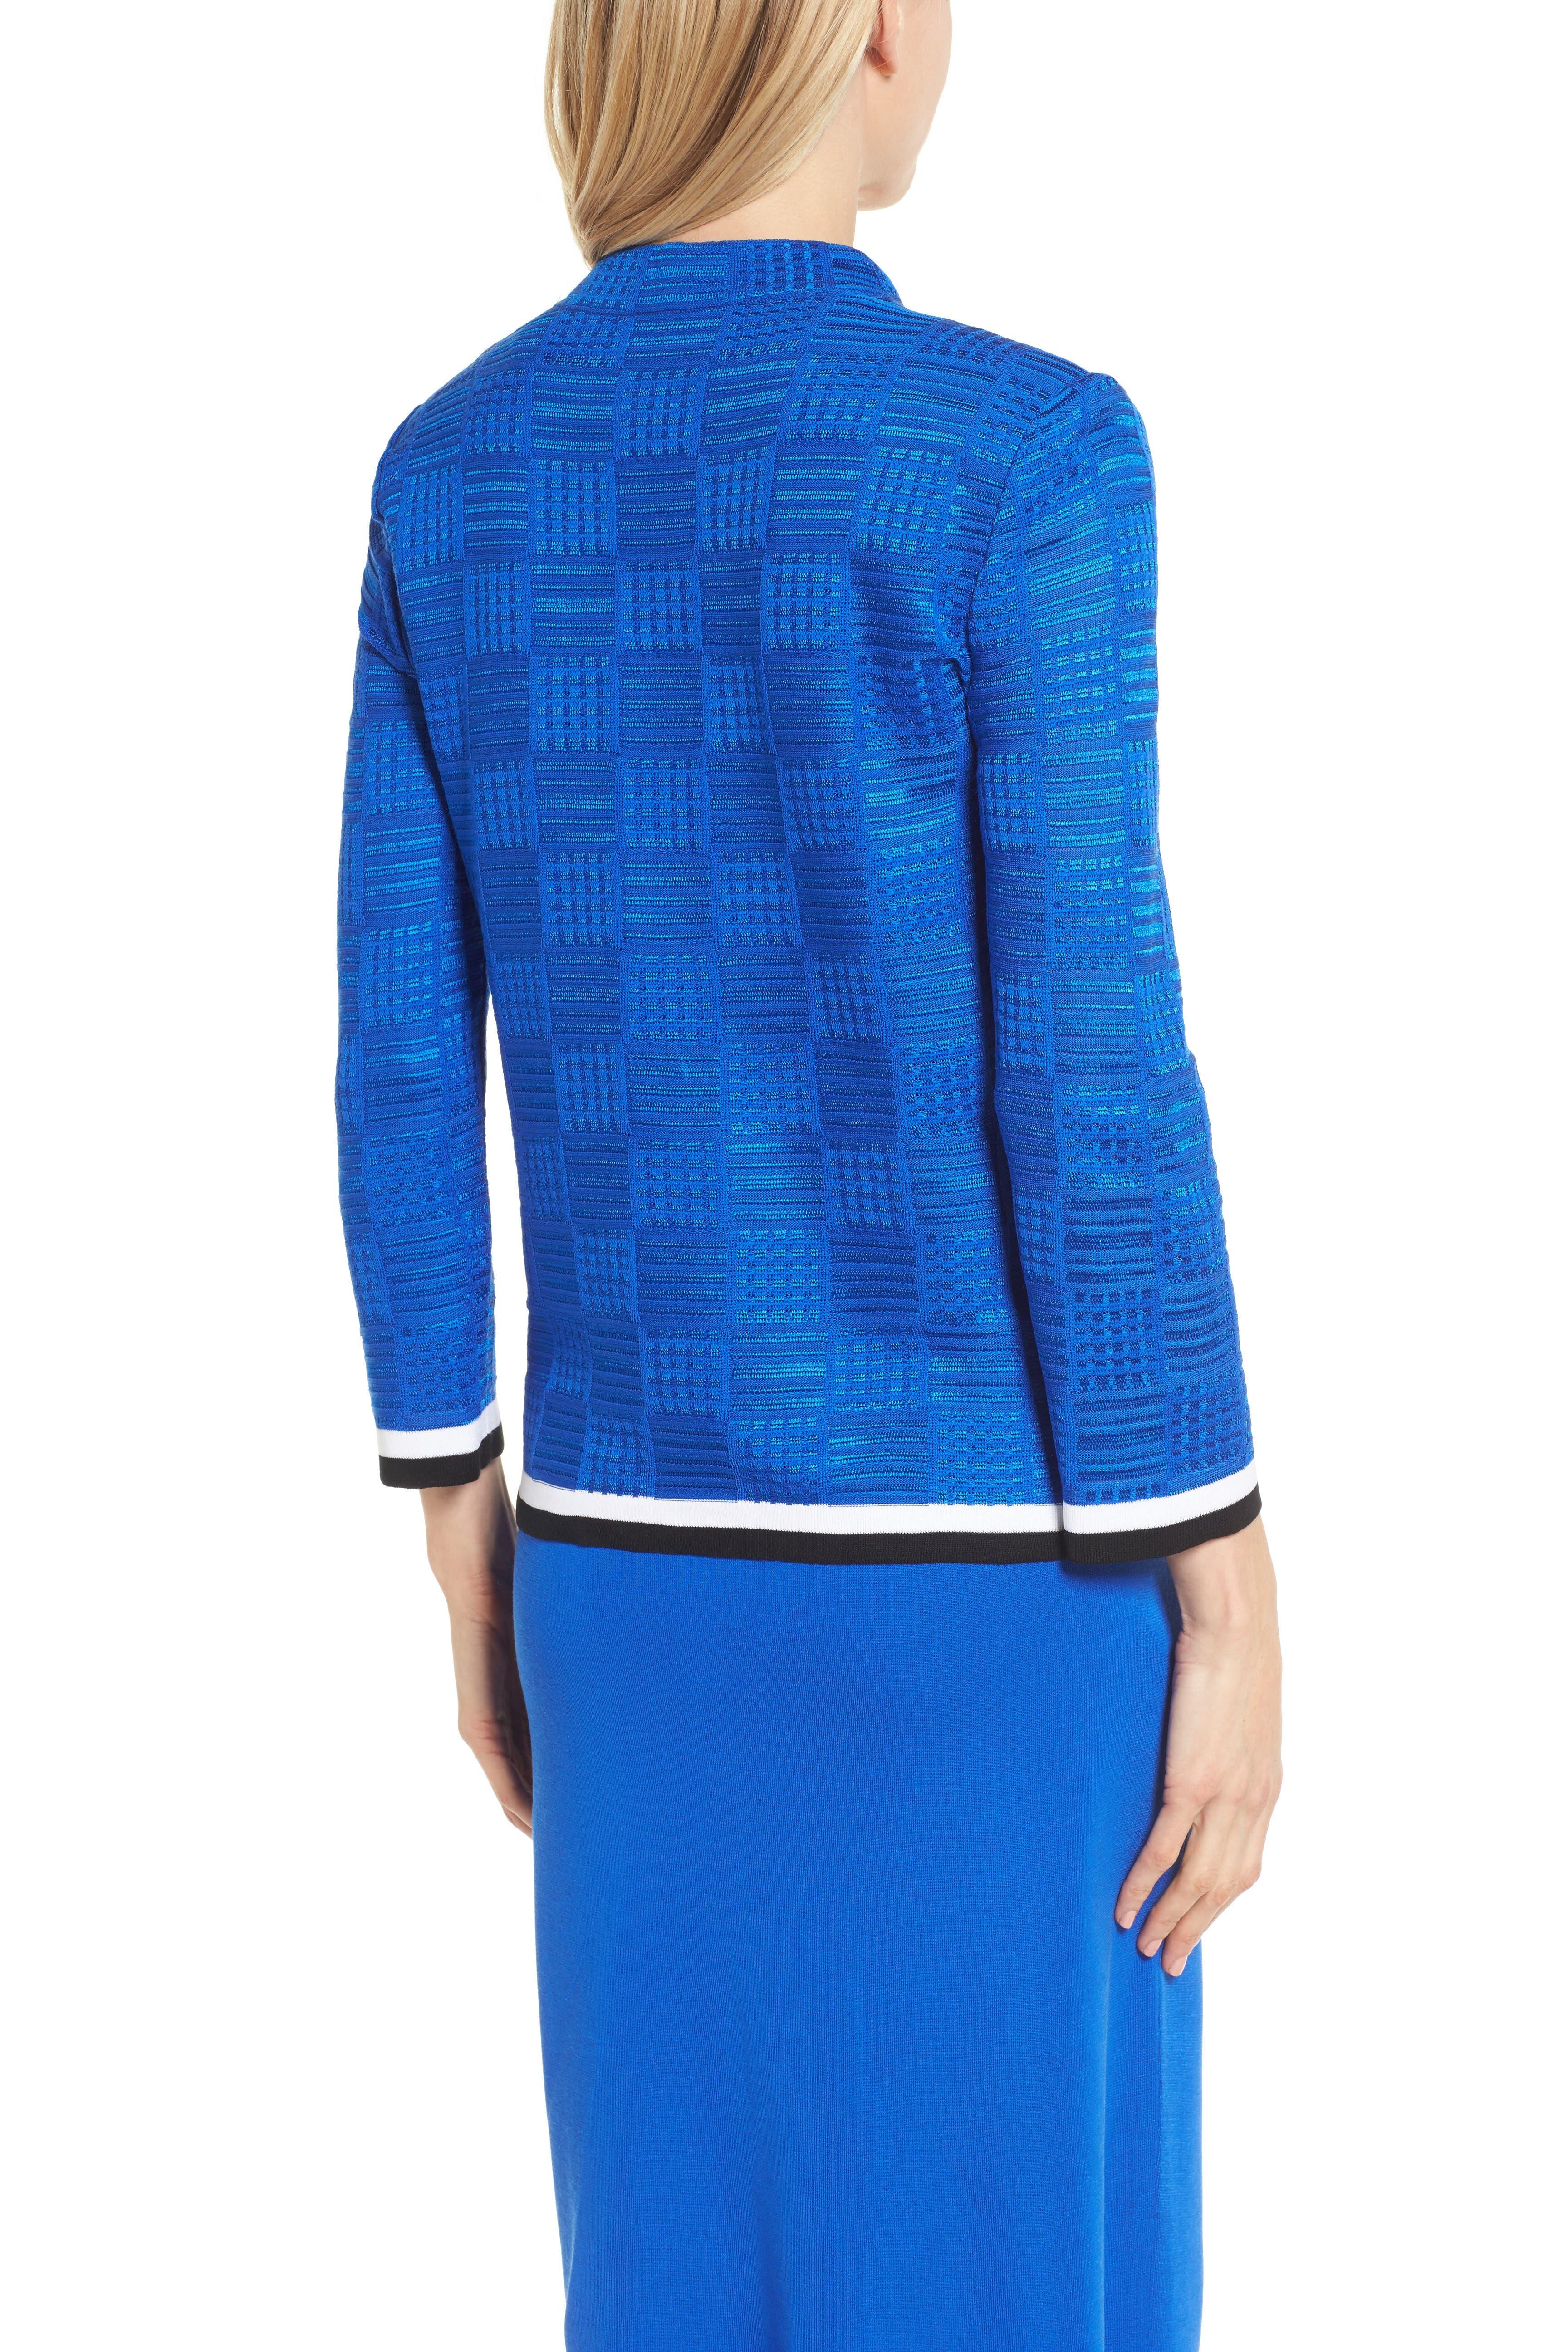 Basketweave Jacquard Jacket,                             Alternate thumbnail 2, color,                             Patriot Blue/ Black/ White